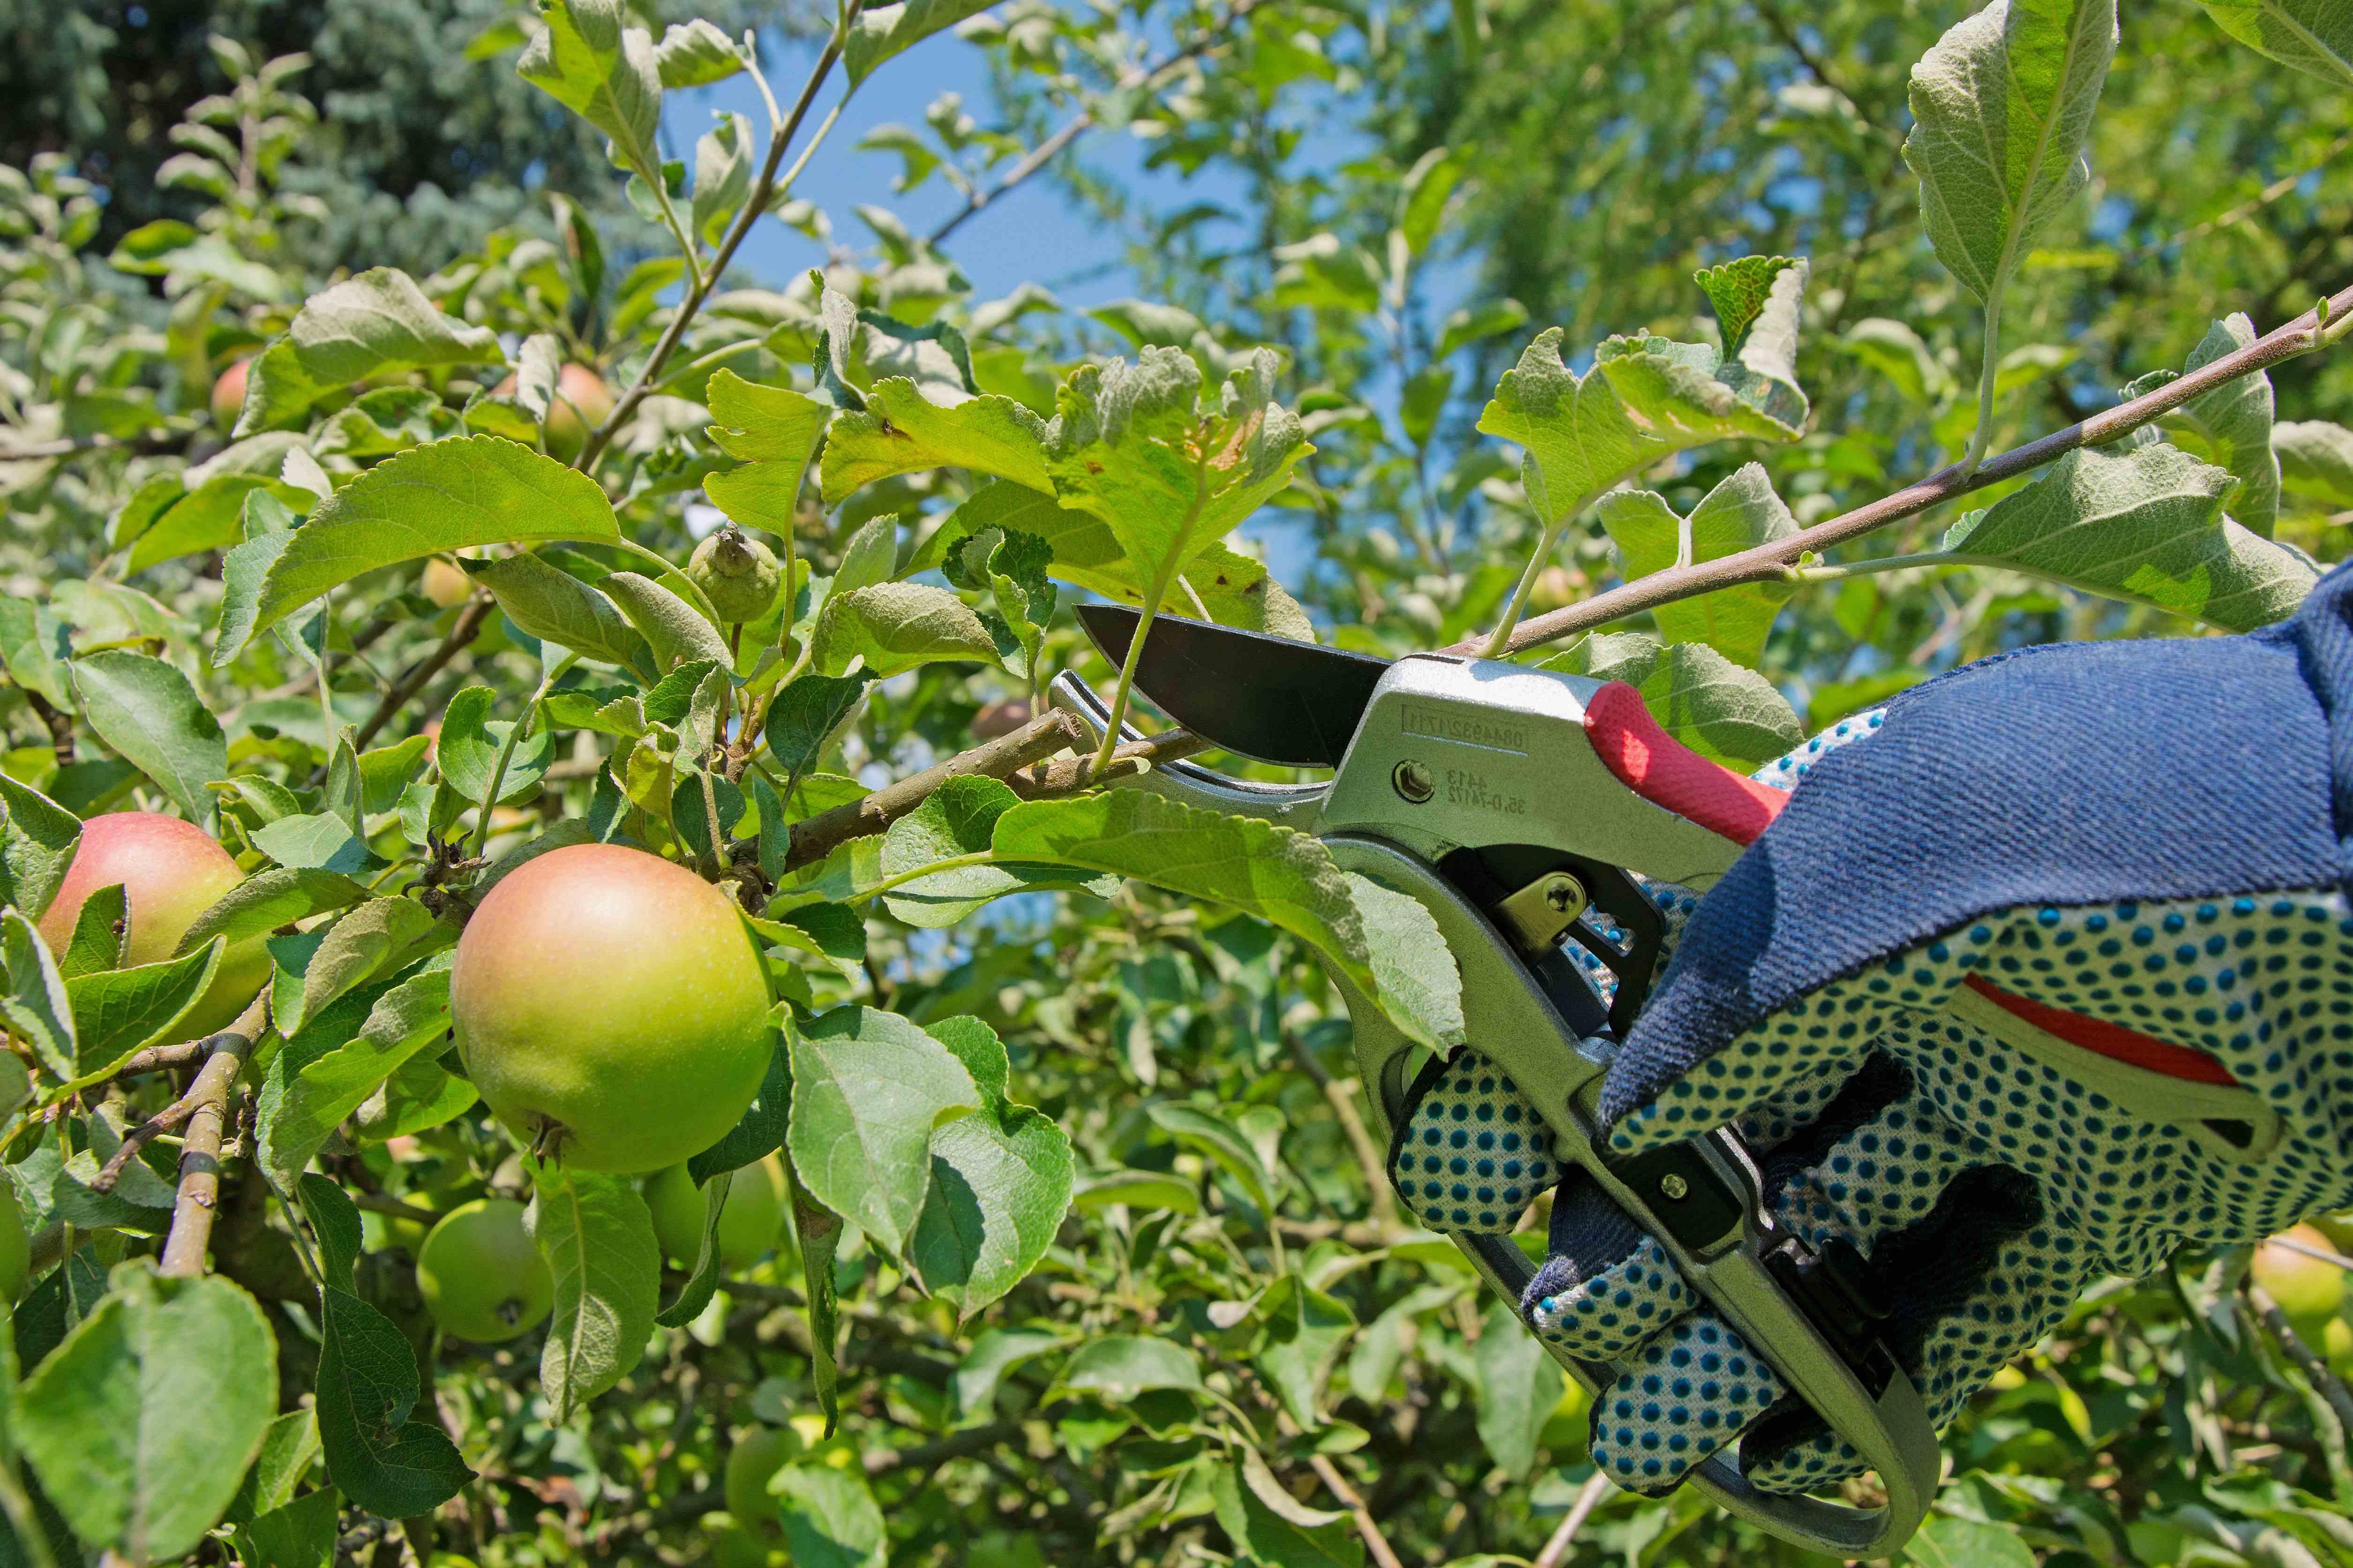 Comment tailler les arbres fruitiers